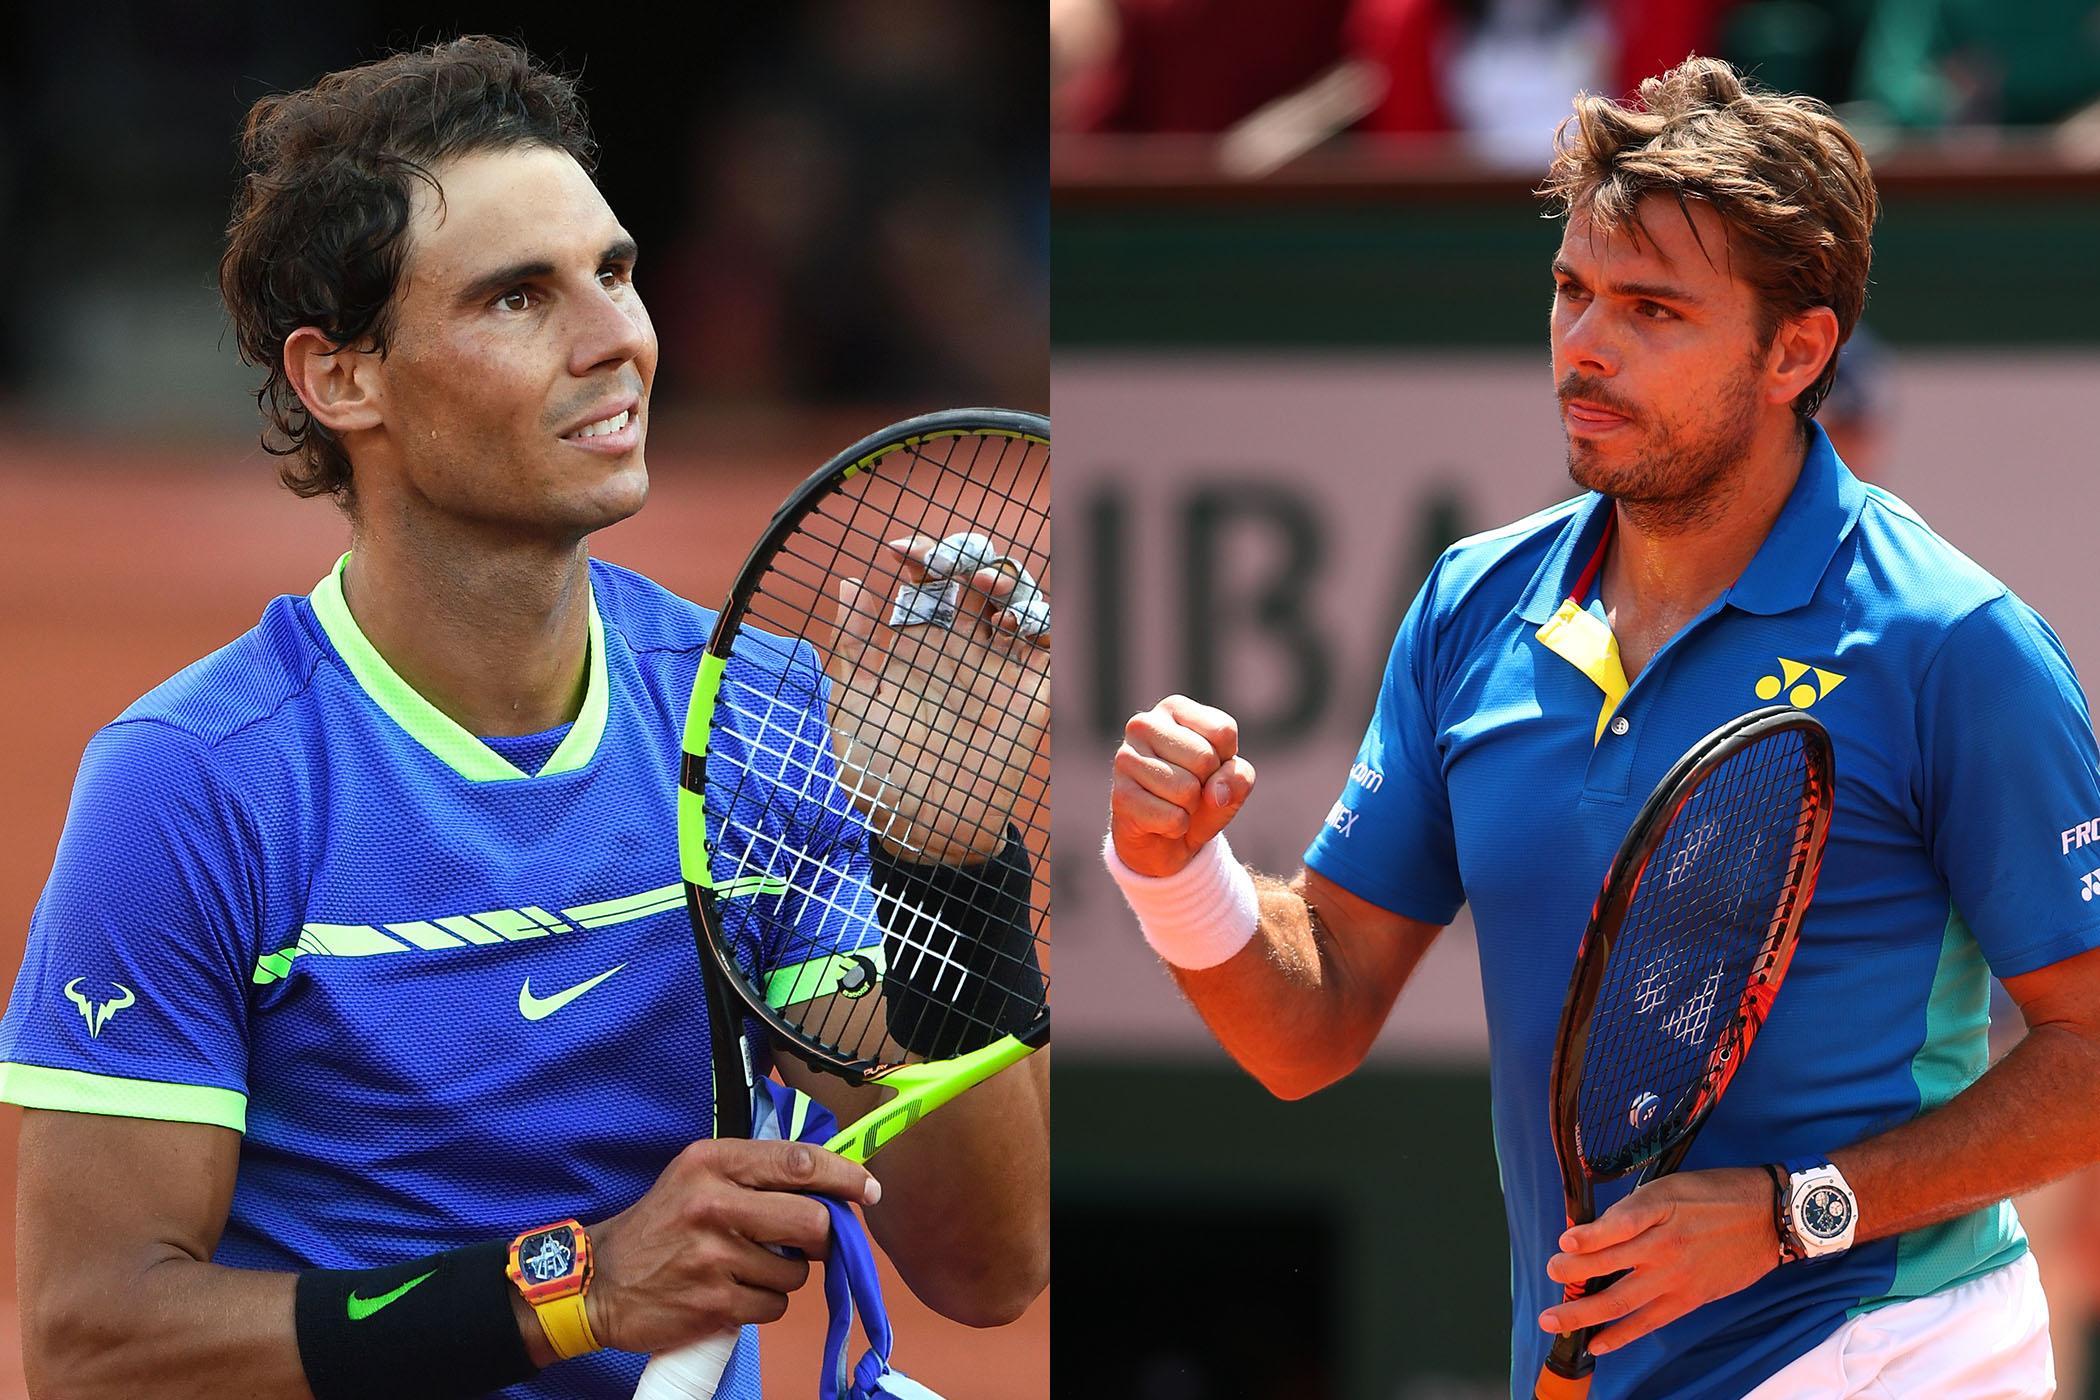 French Open Roland-Garros 2017 Final - Nadal vs Wawrinka - Richard Mille vs Audemars Piguet